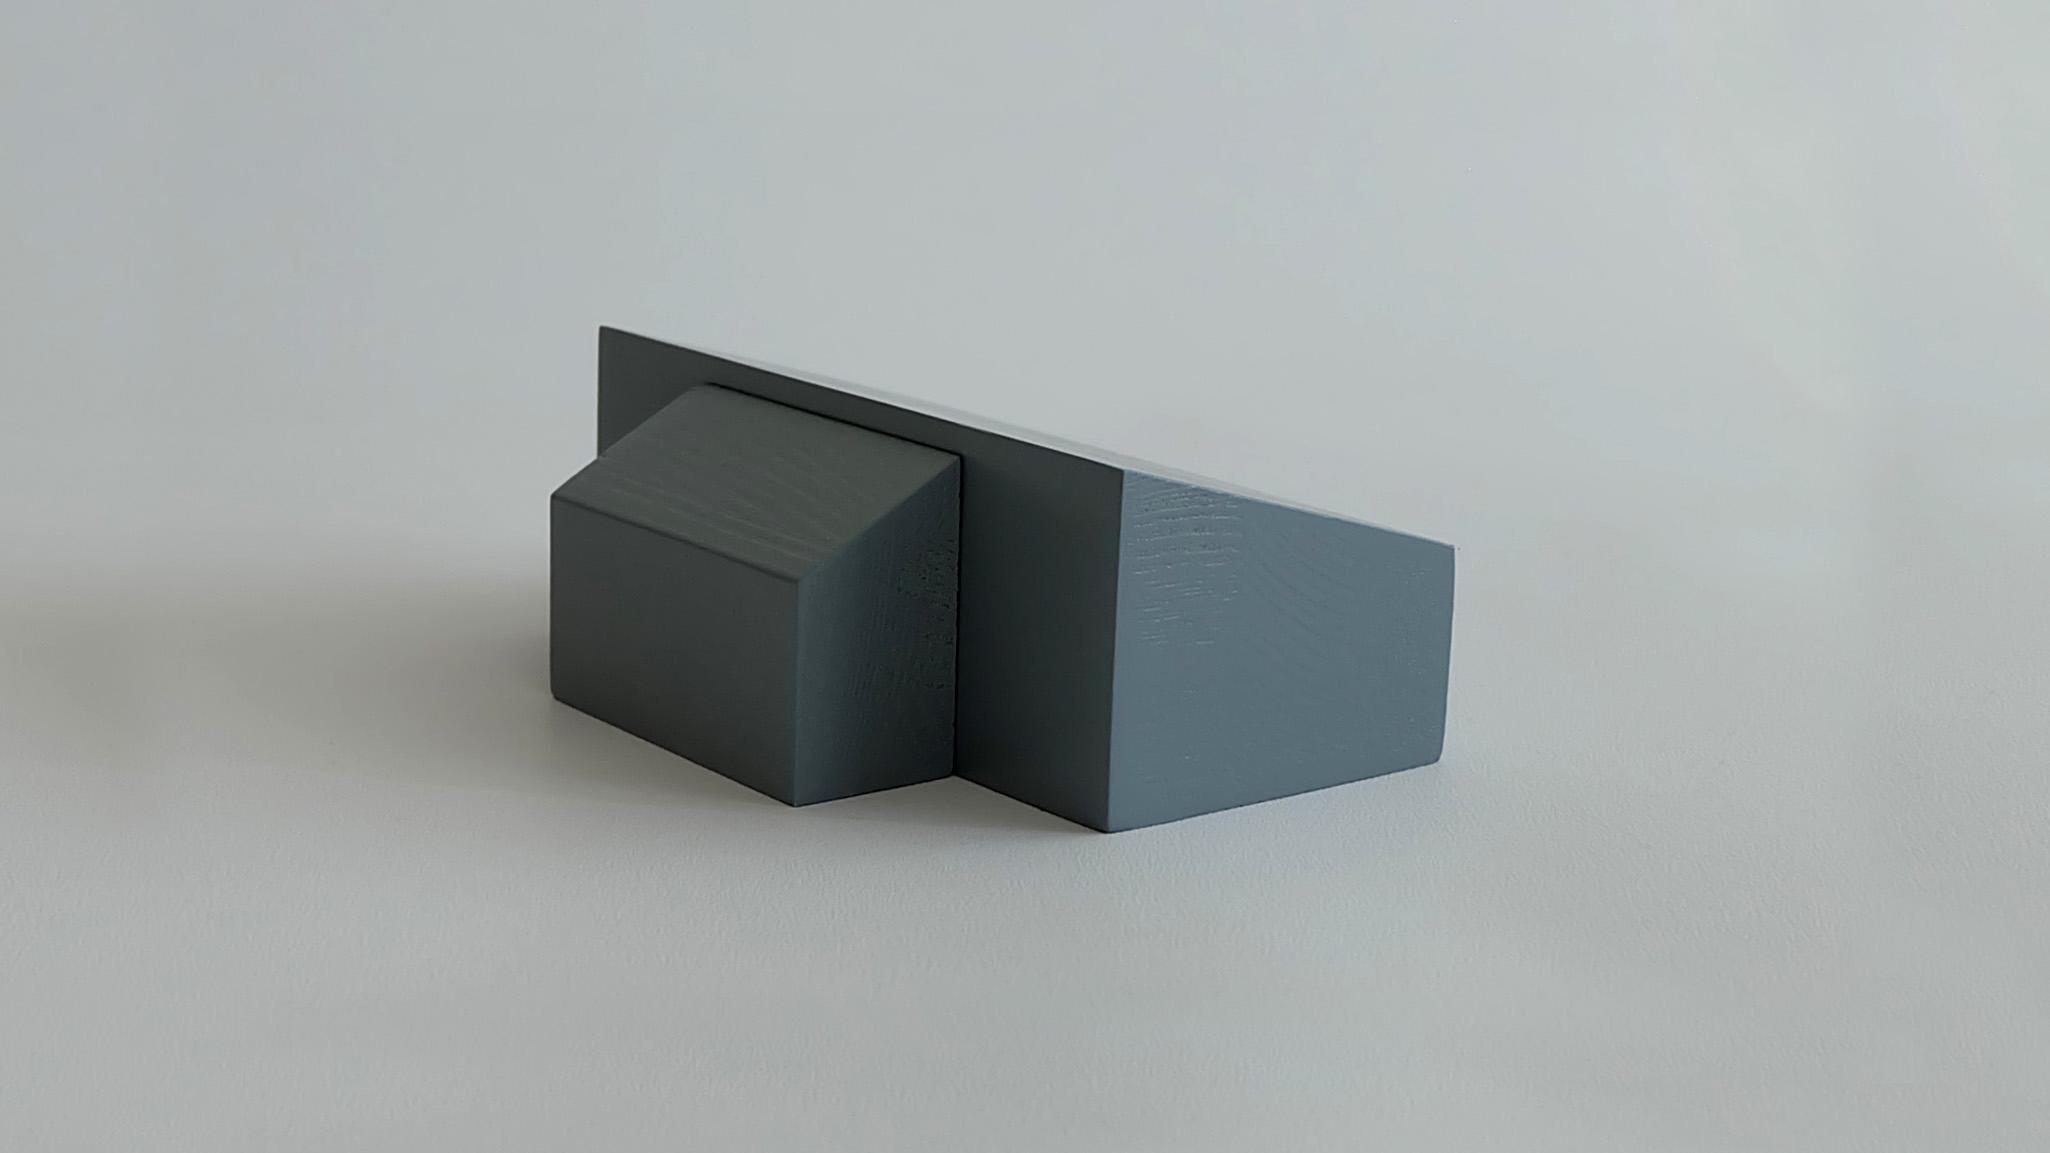 L07:  L05 + mono-pitch roof porch (high side)